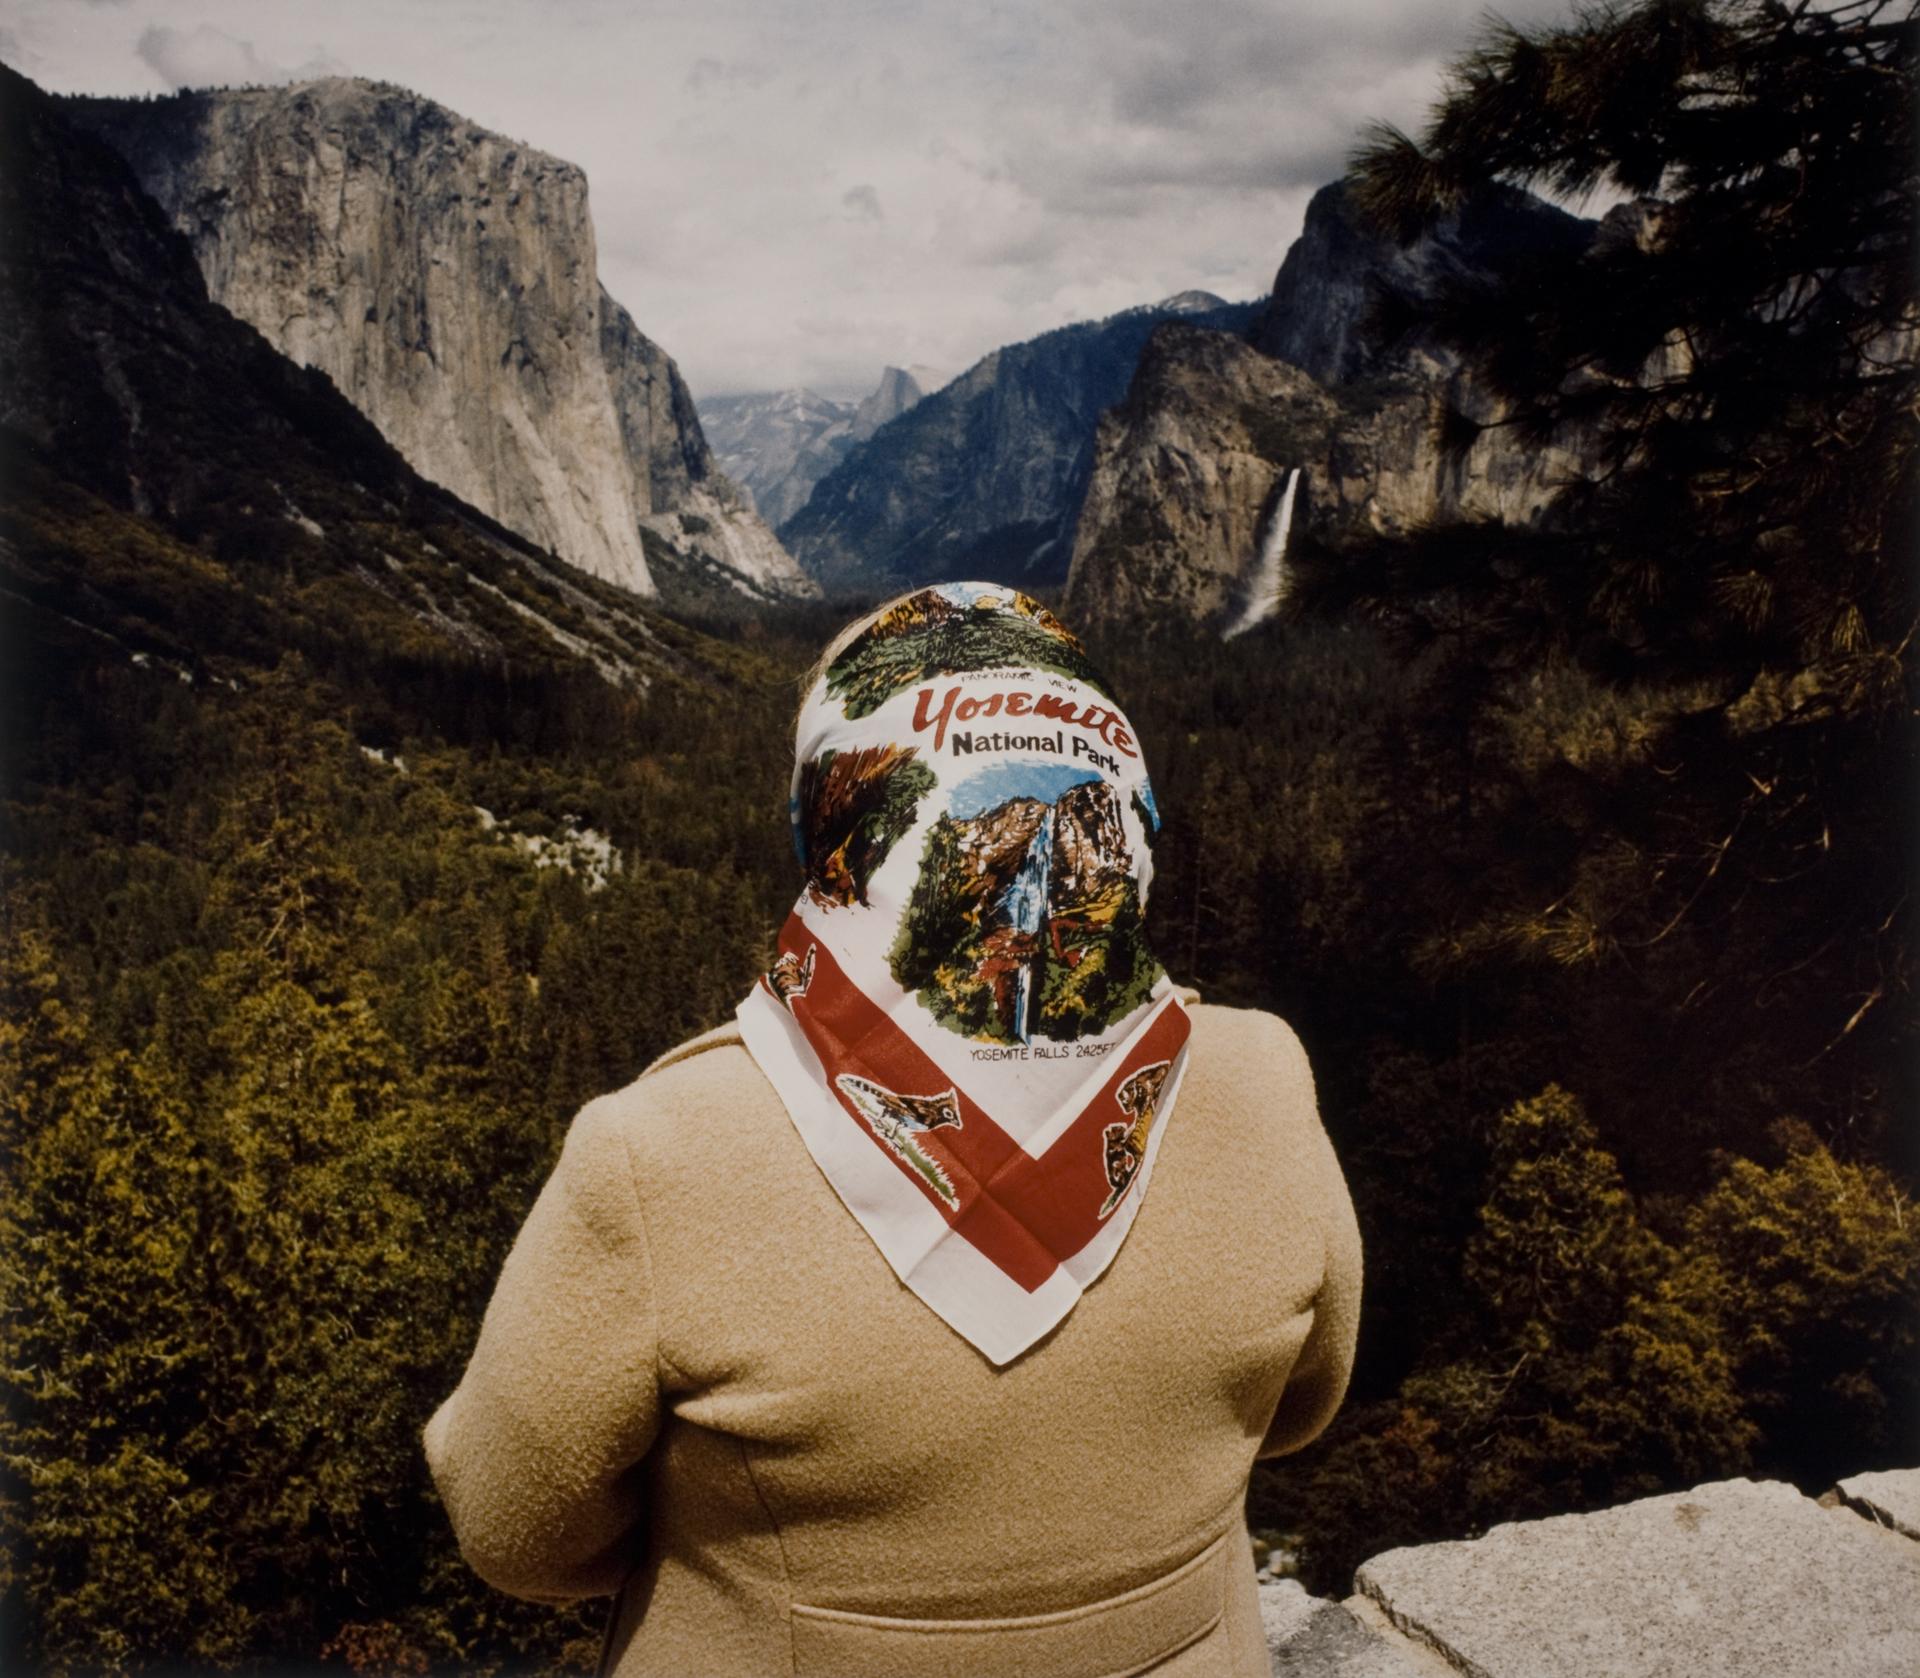 Us National Parks At 100  Stunning Photos Showcase 100